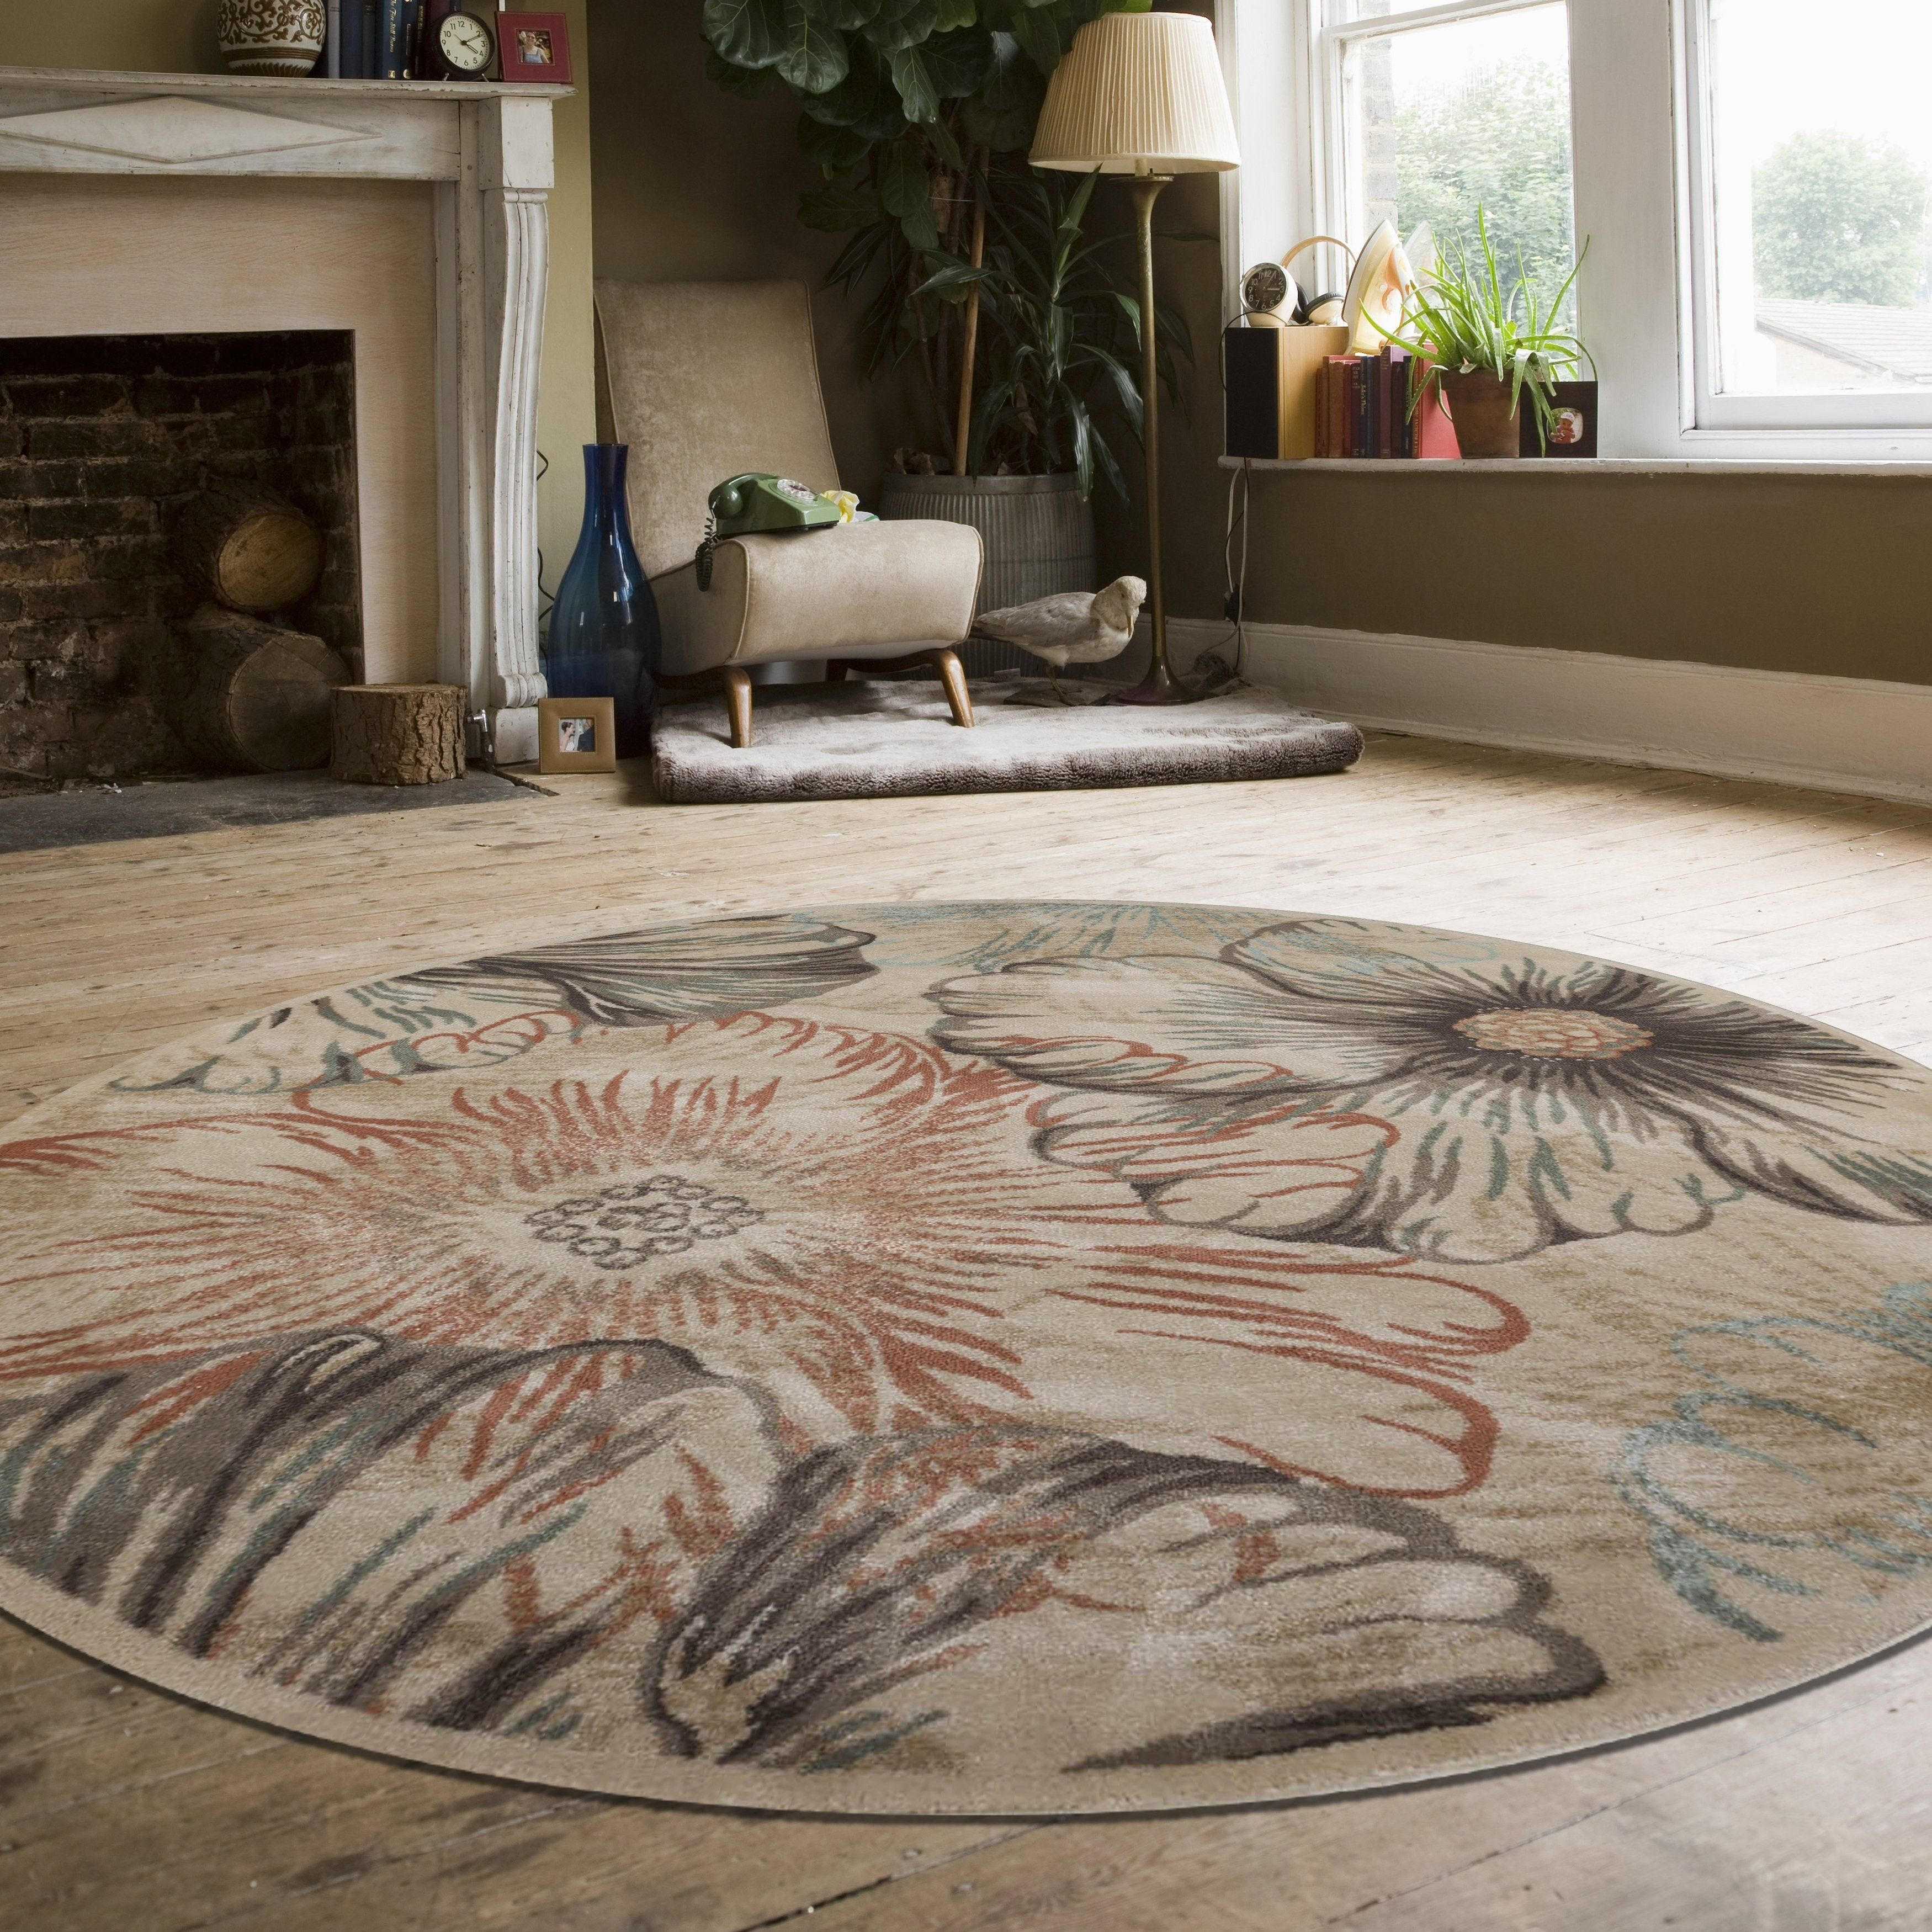 Gallina Panel Area Rug 5 3 X 5 3 Ivory Admire Home Living